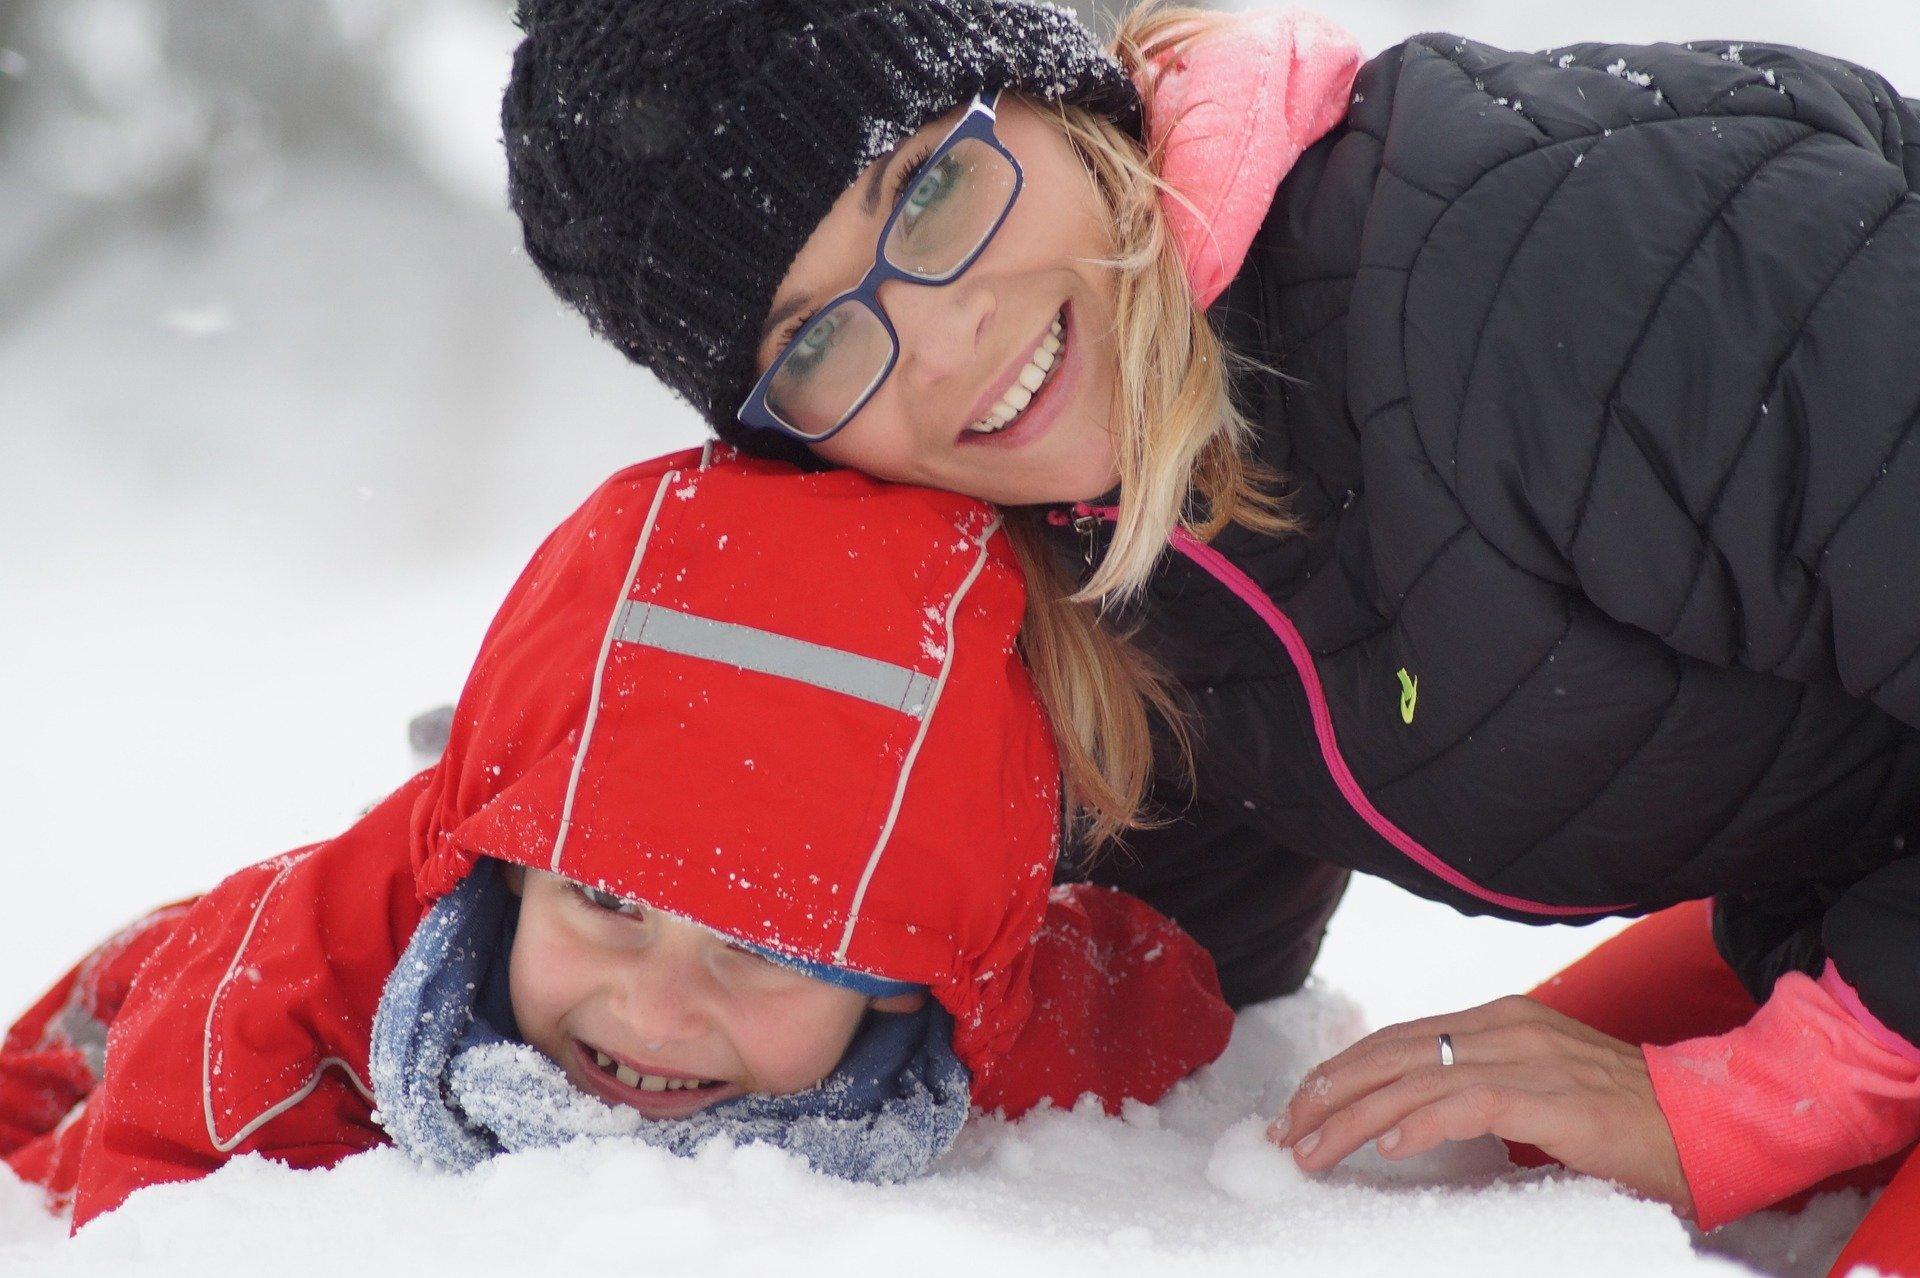 Nauka jazdy na nartach dziecko